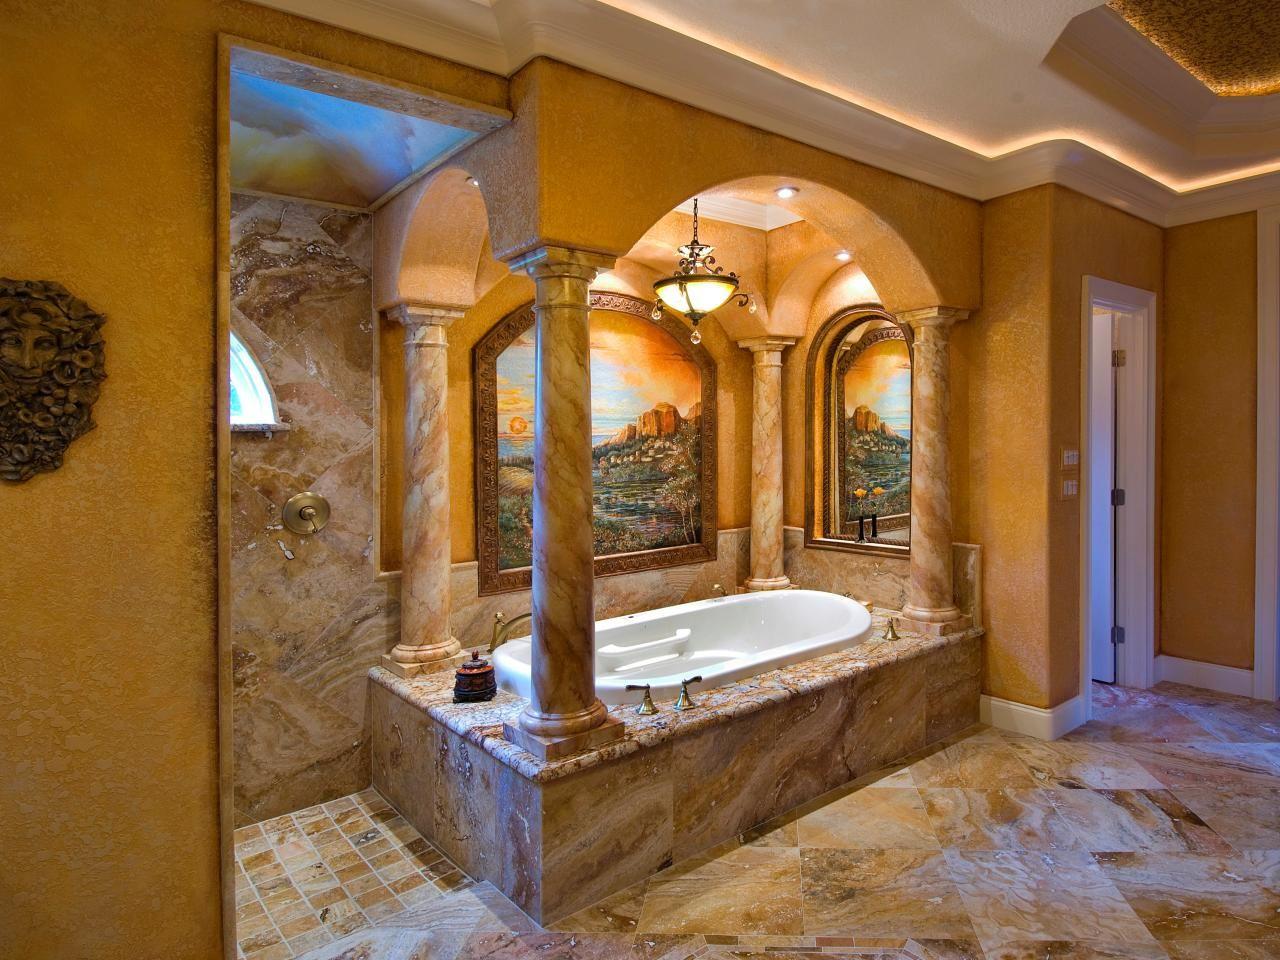 Mediterranean Bathroom Design Prepossessing Rooms Viewer  Hgtv  Home Designs  Pinterest  Tuscan Style Design Inspiration